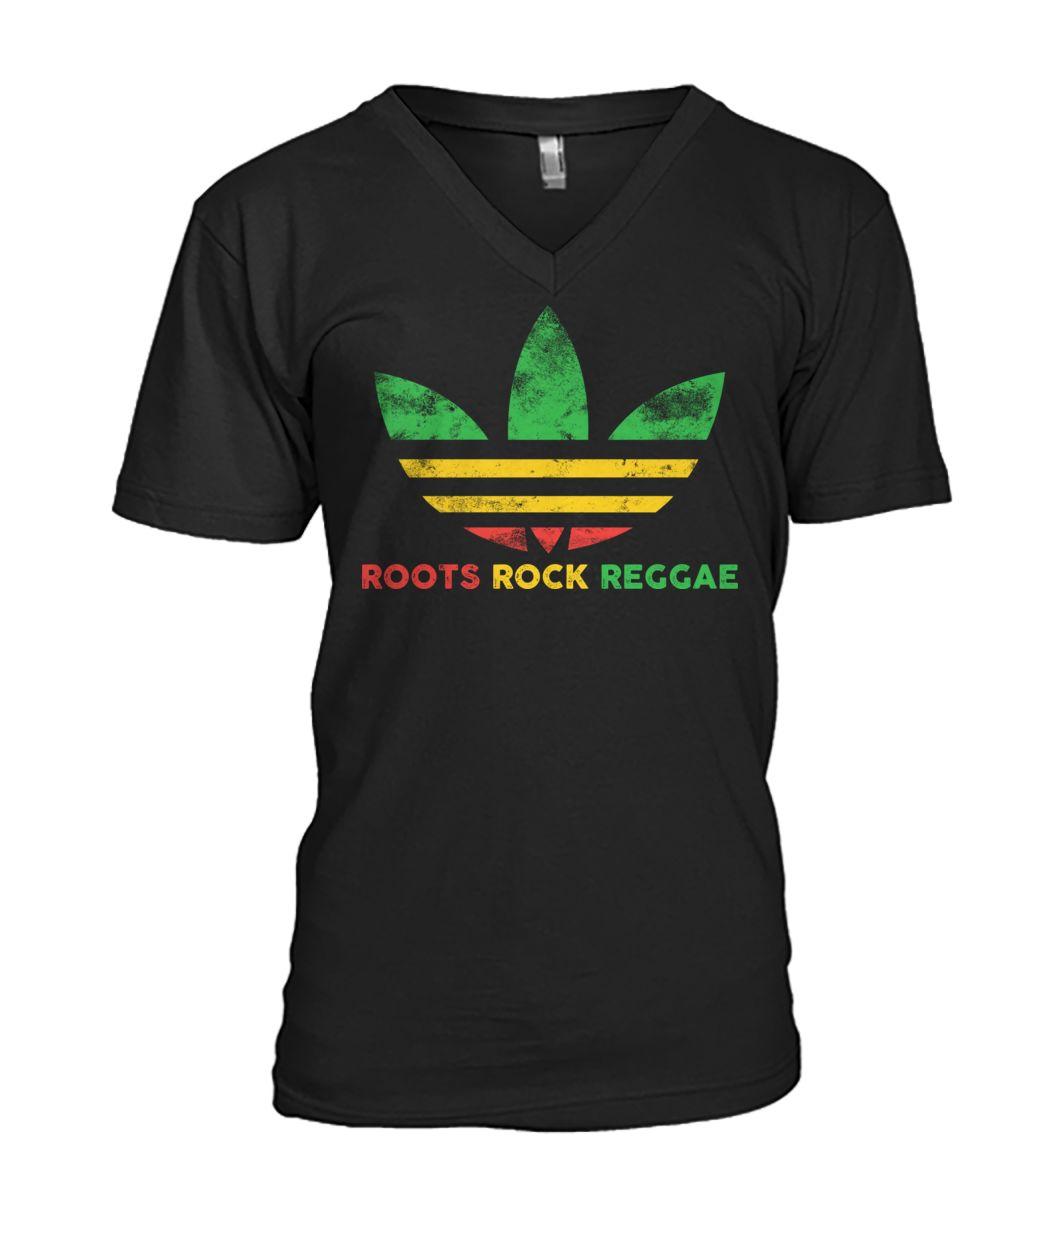 Roots Rock Reggae Adidas vintage v-neck